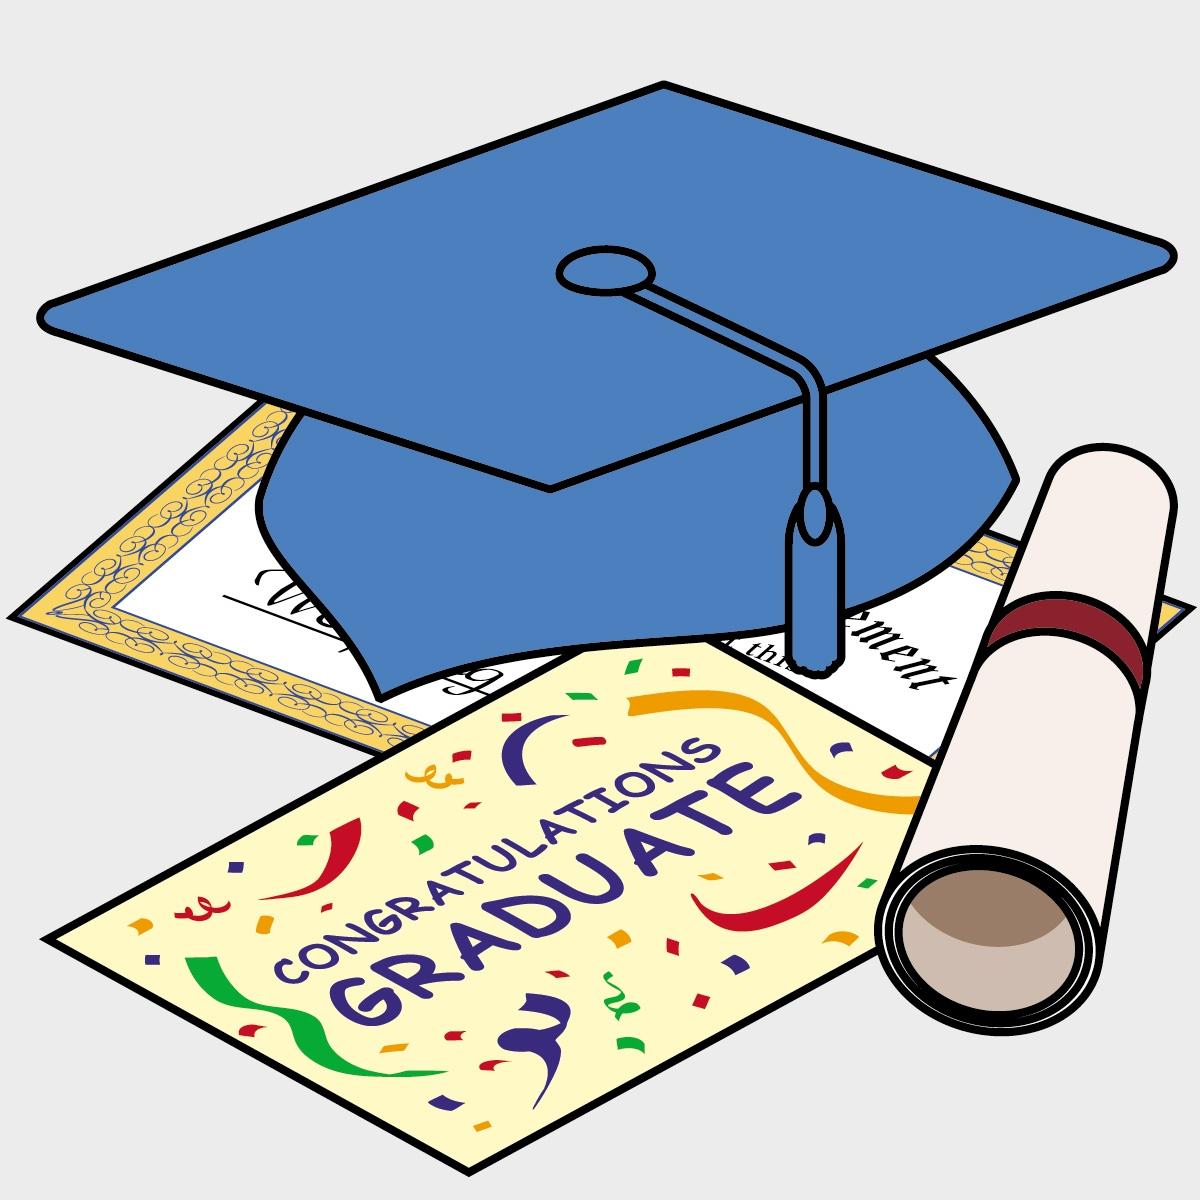 Graduation clipart head start Graduation com Preschool free graduation